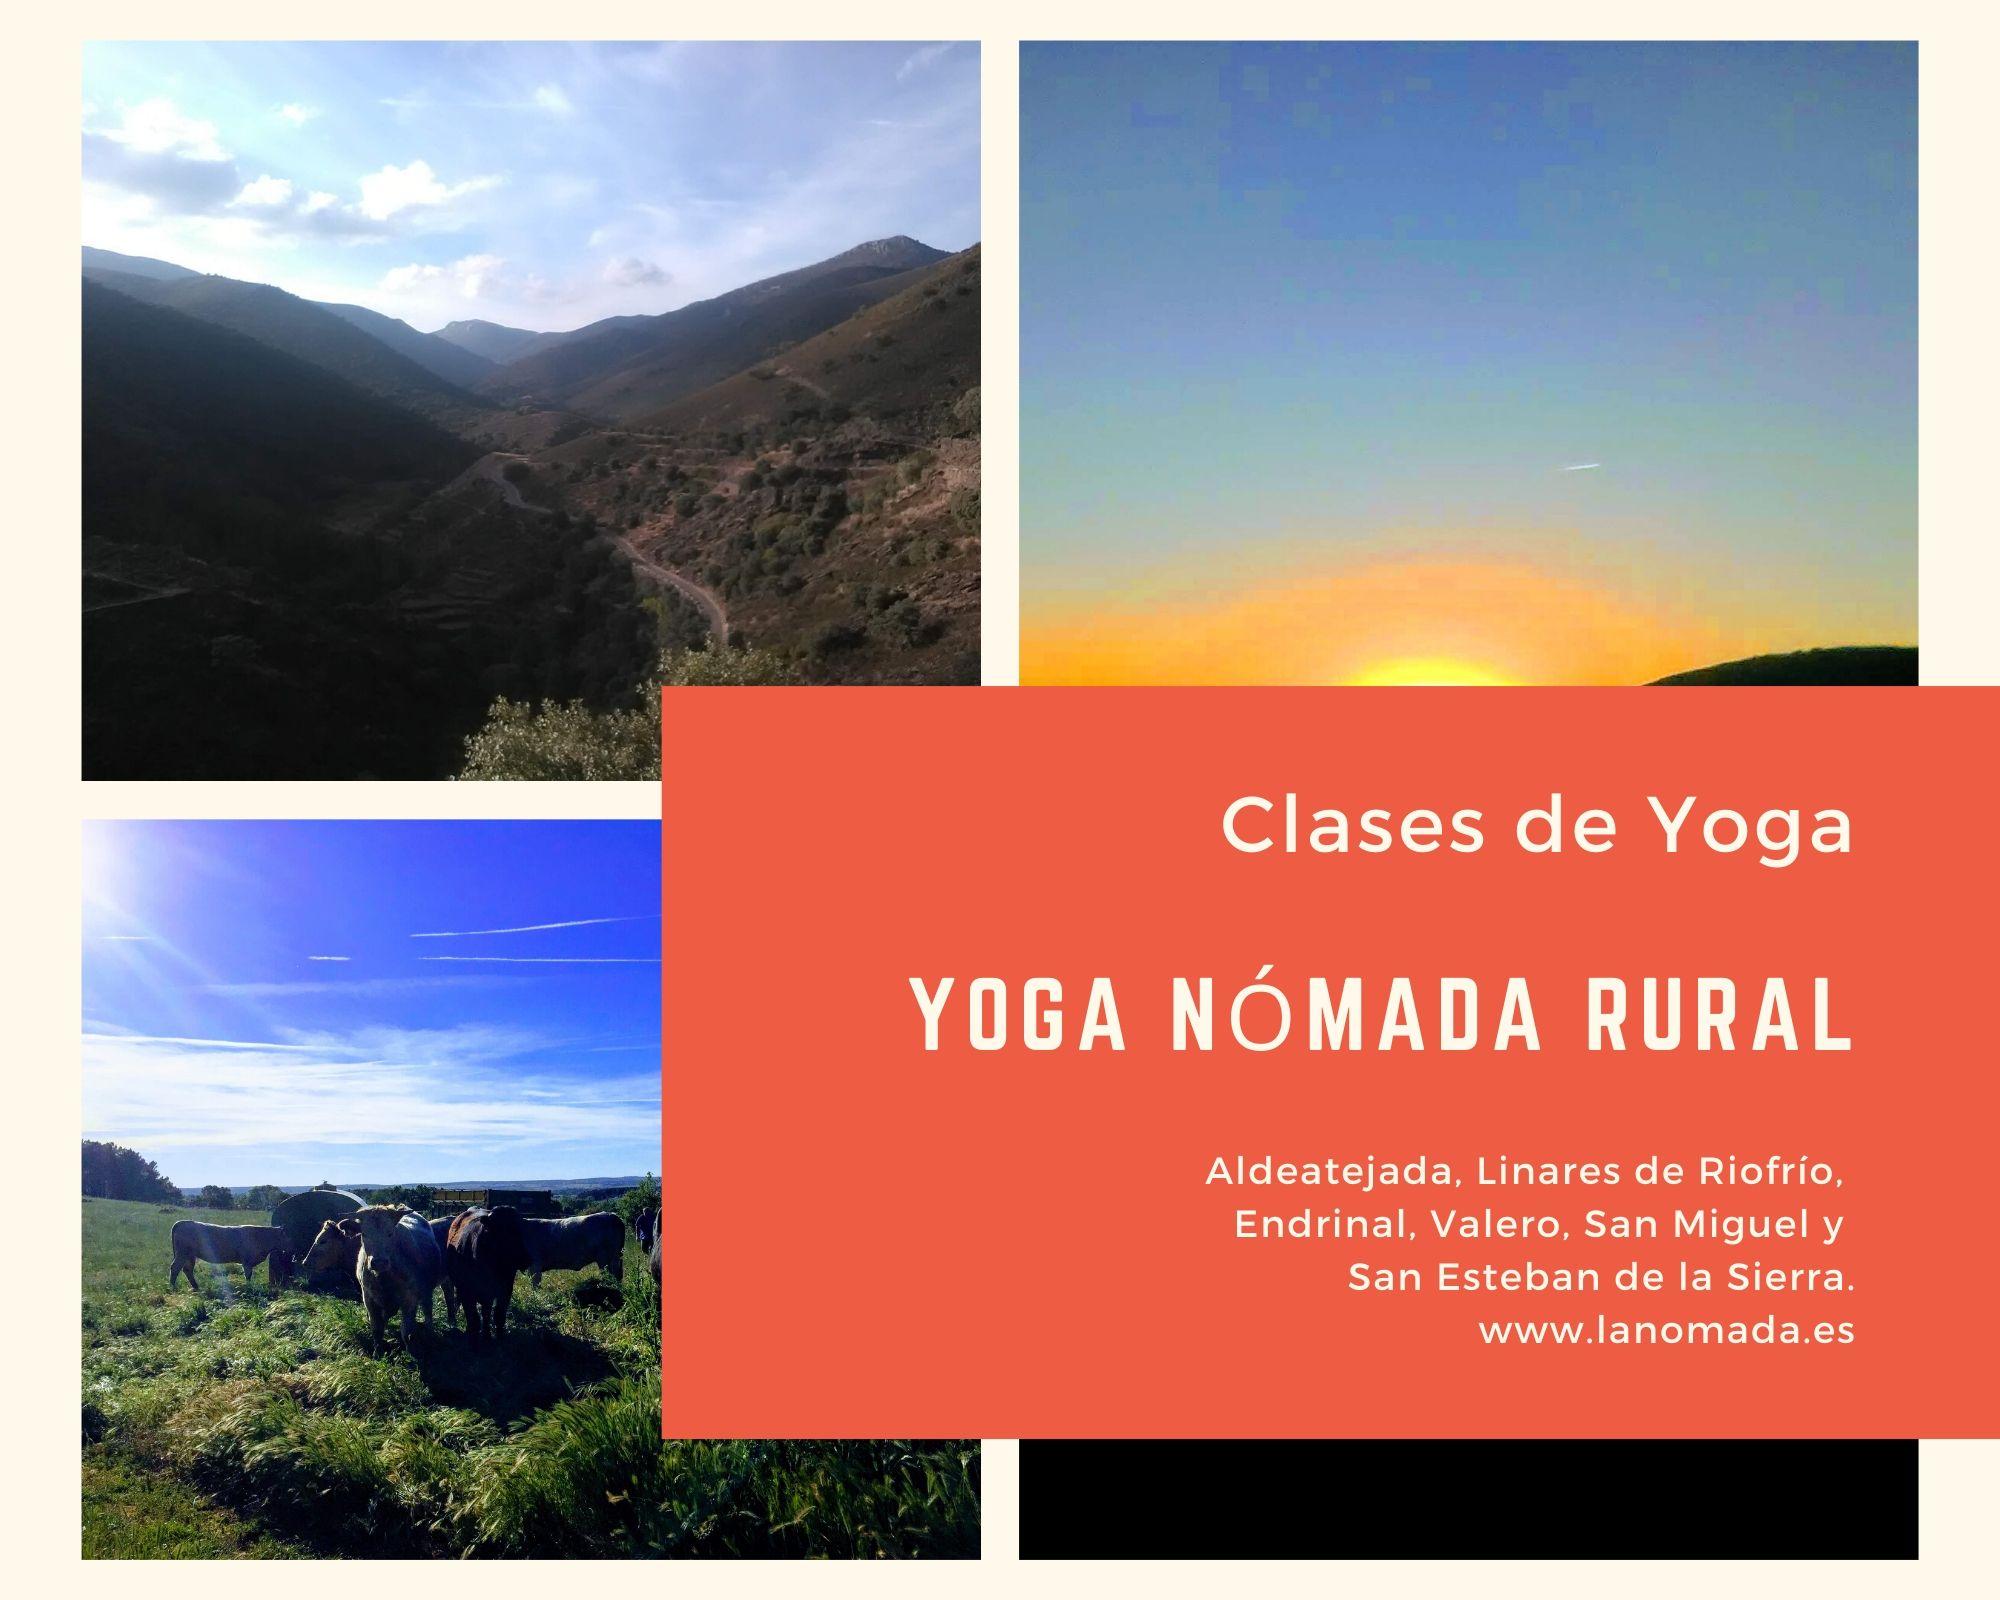 Yoga Nómada Rural